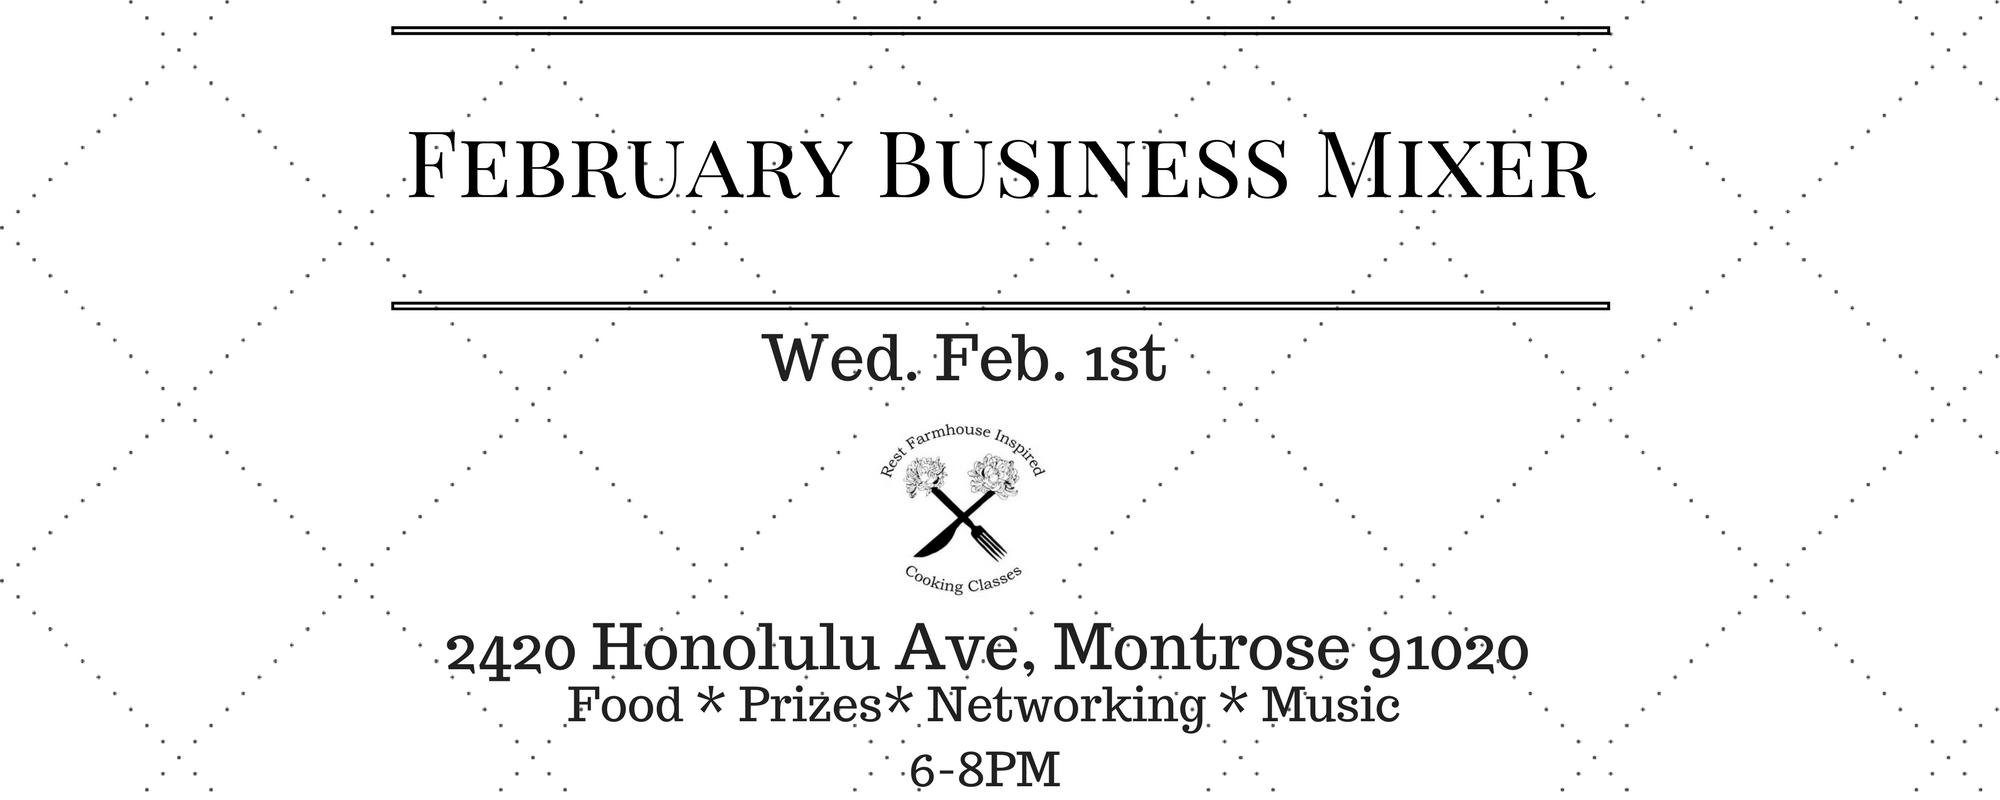 February Business Mixer